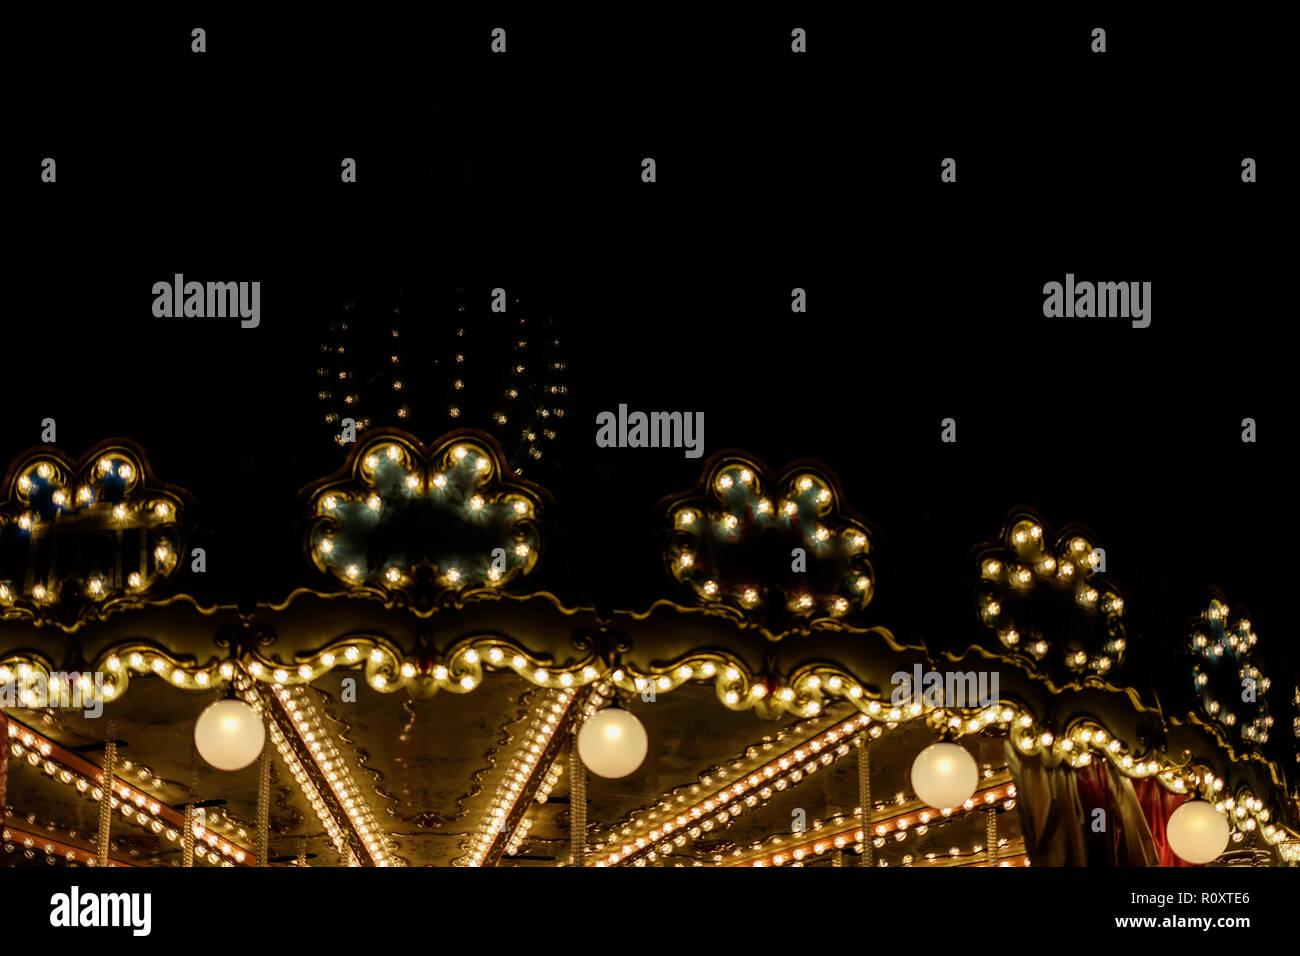 Illuminated golden bright carousel, silhouette on night city, romantic, nostalgic mood, melancholy, festive occasions, copy space - Stock Image